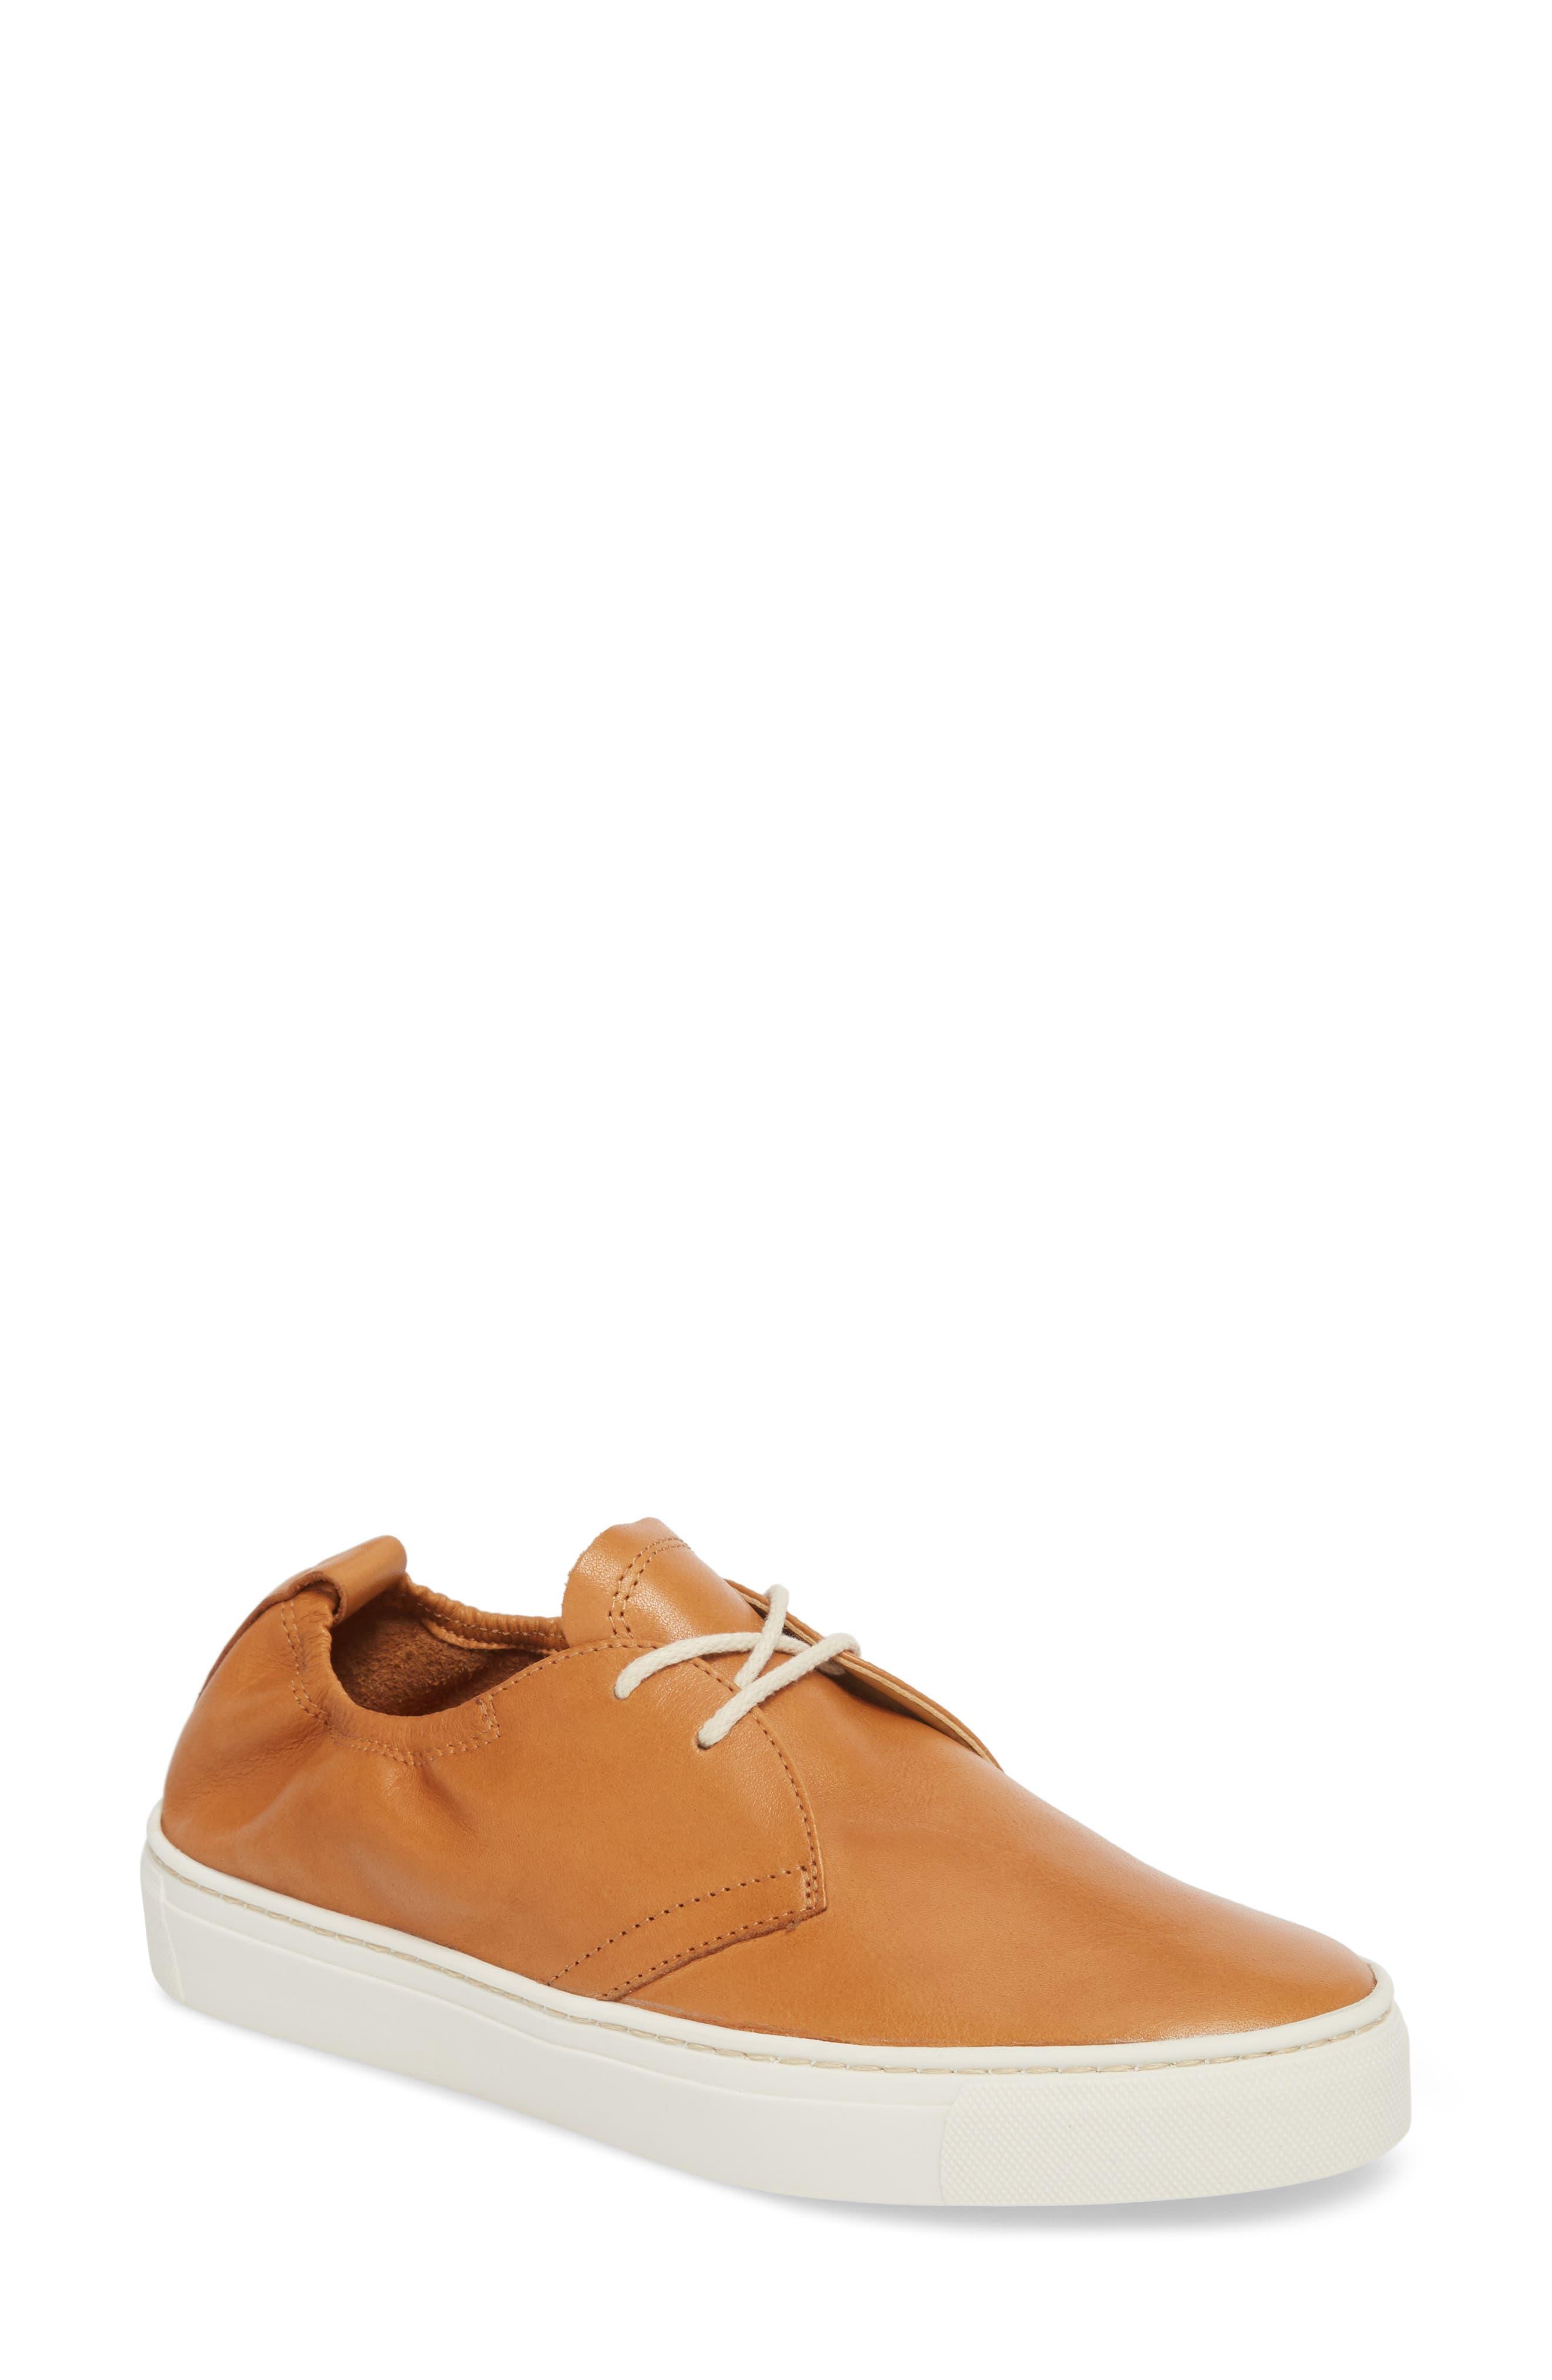 Sneak Up Sneaker,                         Main,                         color, Cognac Leather